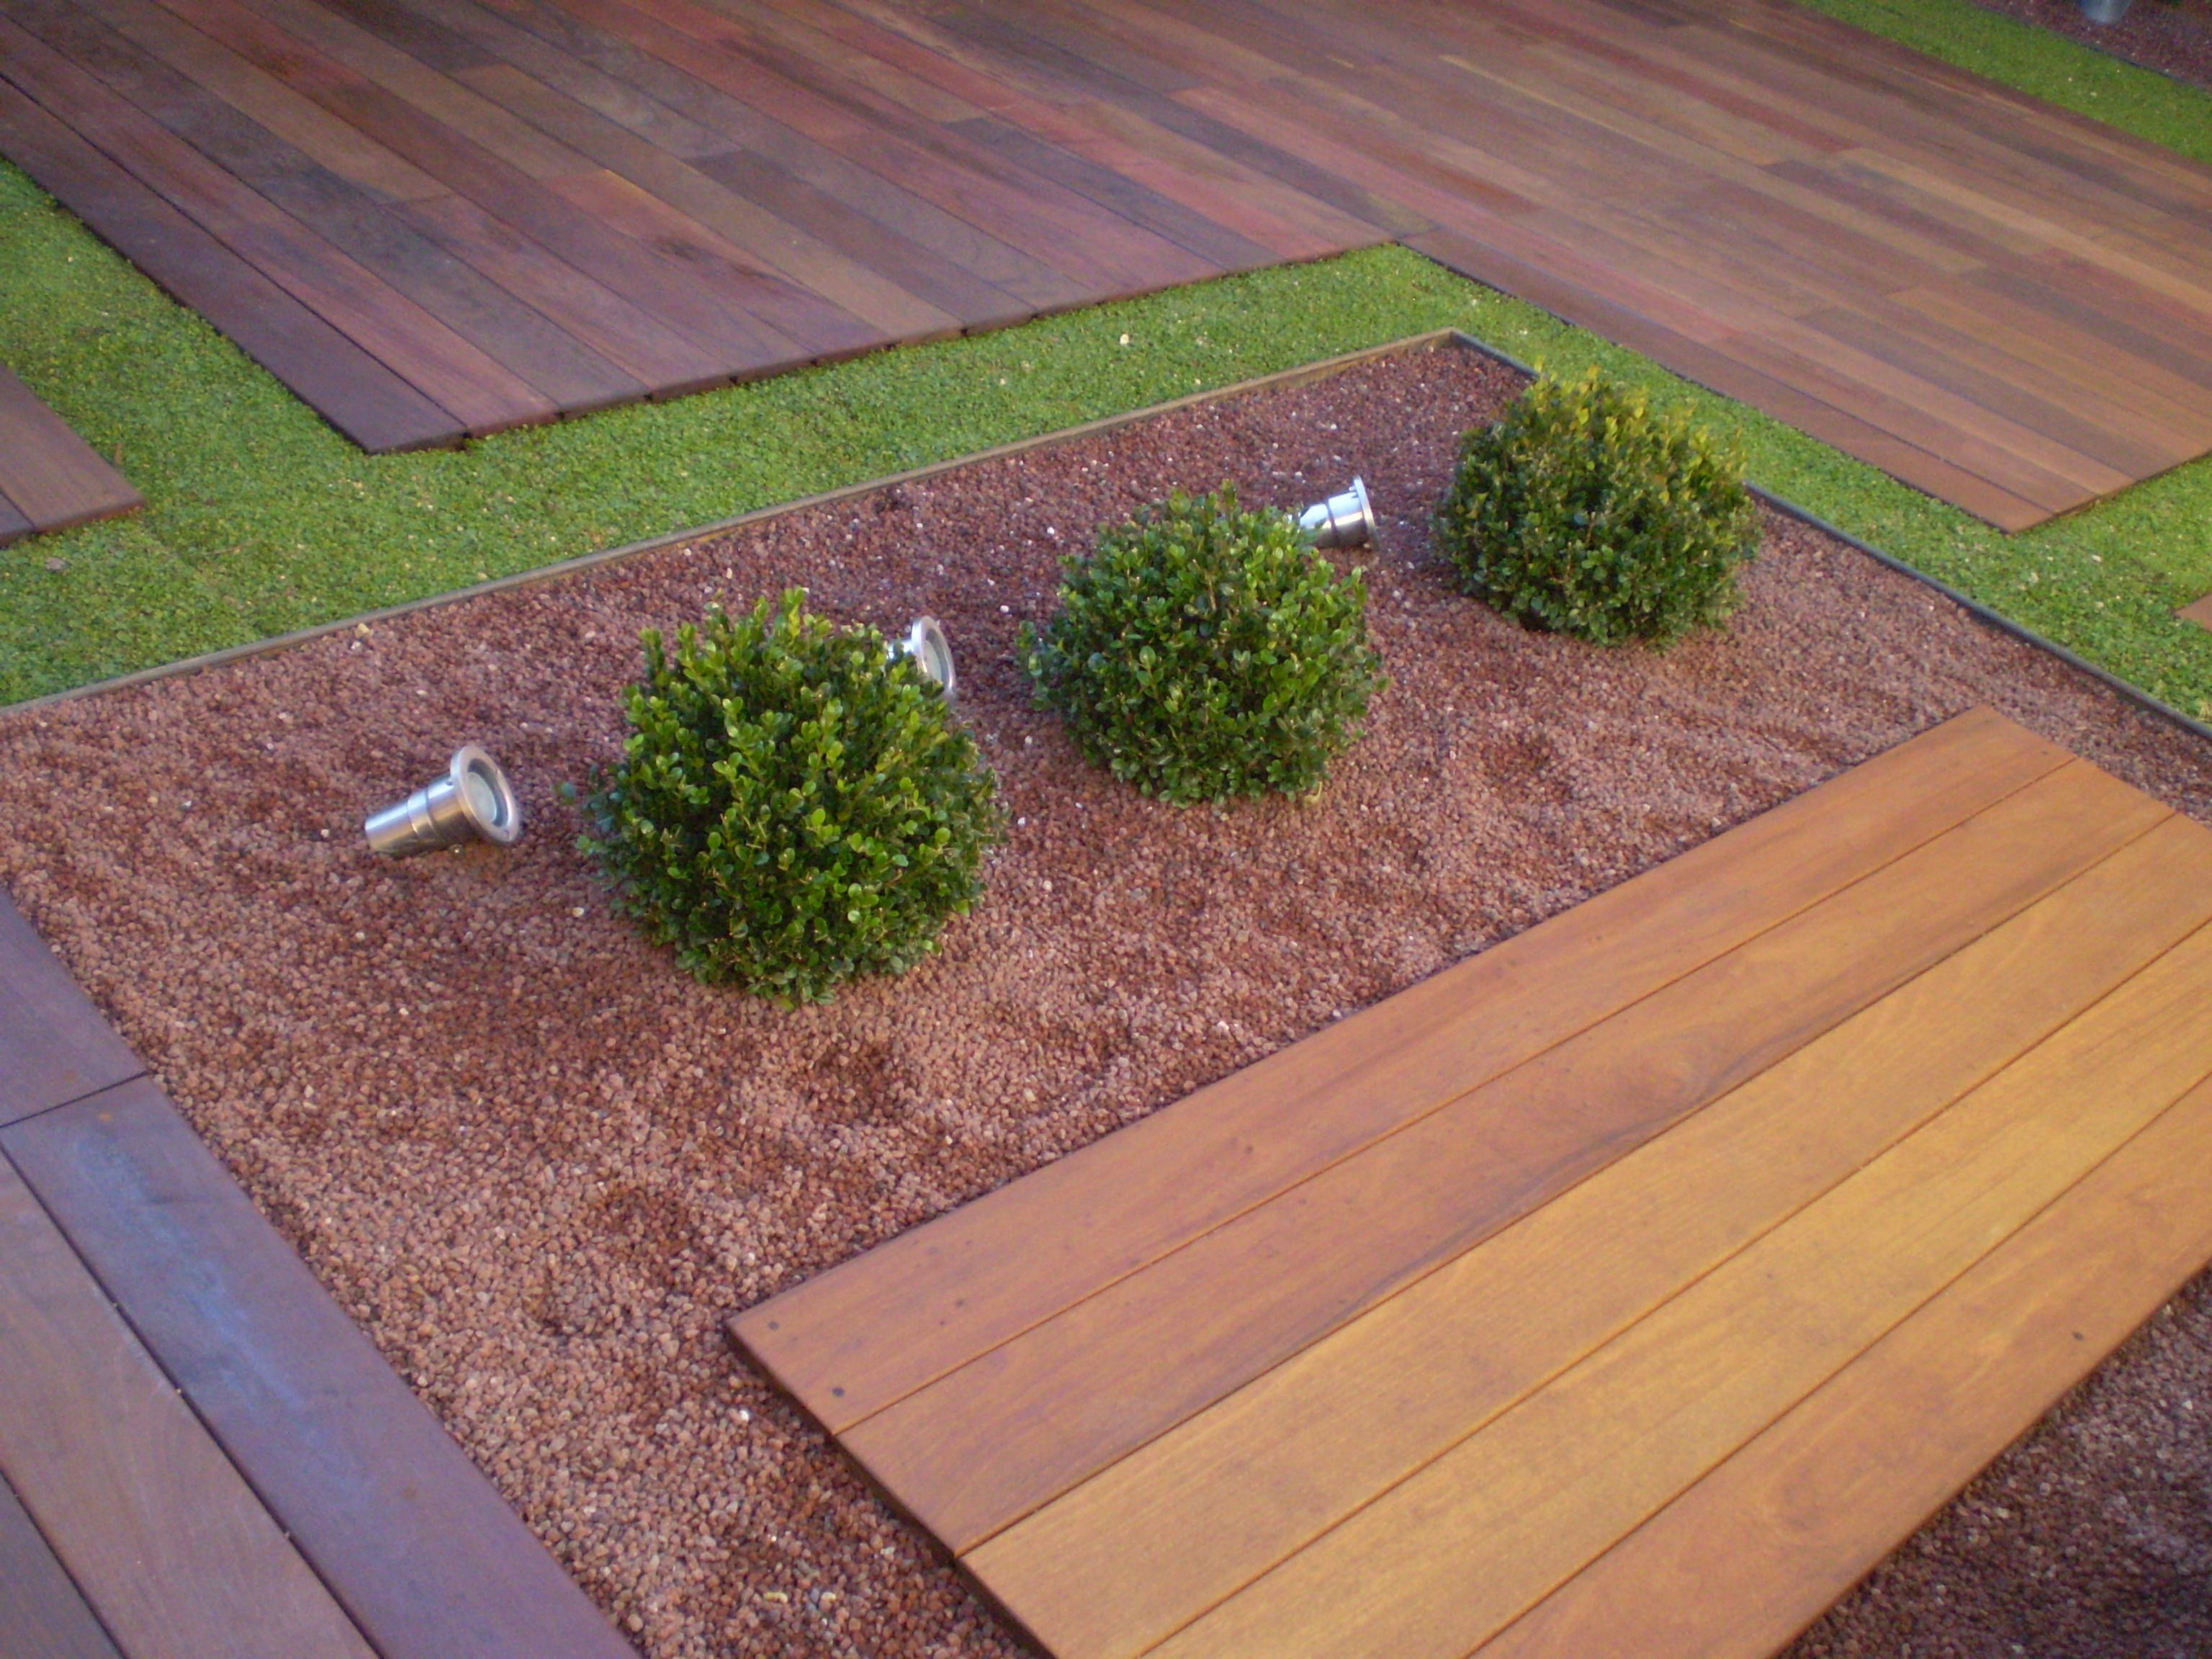 Piedras para paisajismo buscar con google jard n for Paisajismo jardines exteriores